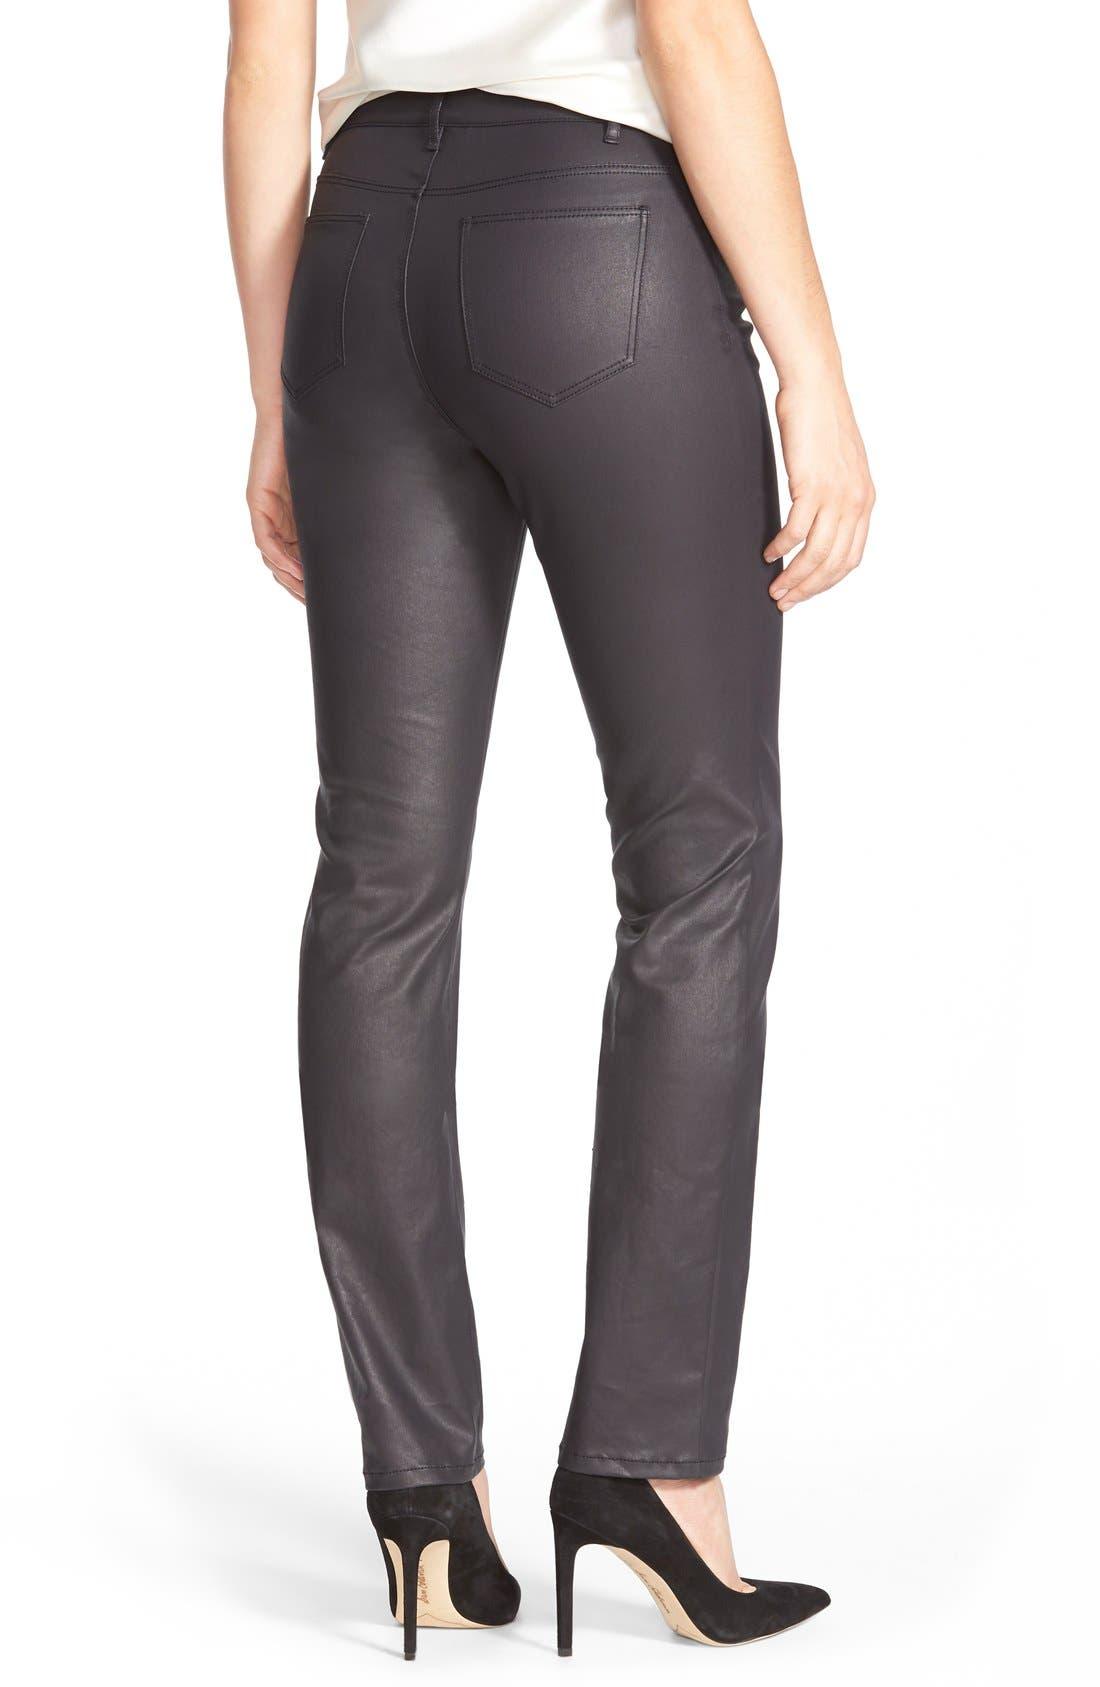 LAFAYETTE 148 NEW YORK, Waxed Denim Slim Leg Jeans, Alternate thumbnail 5, color, INK